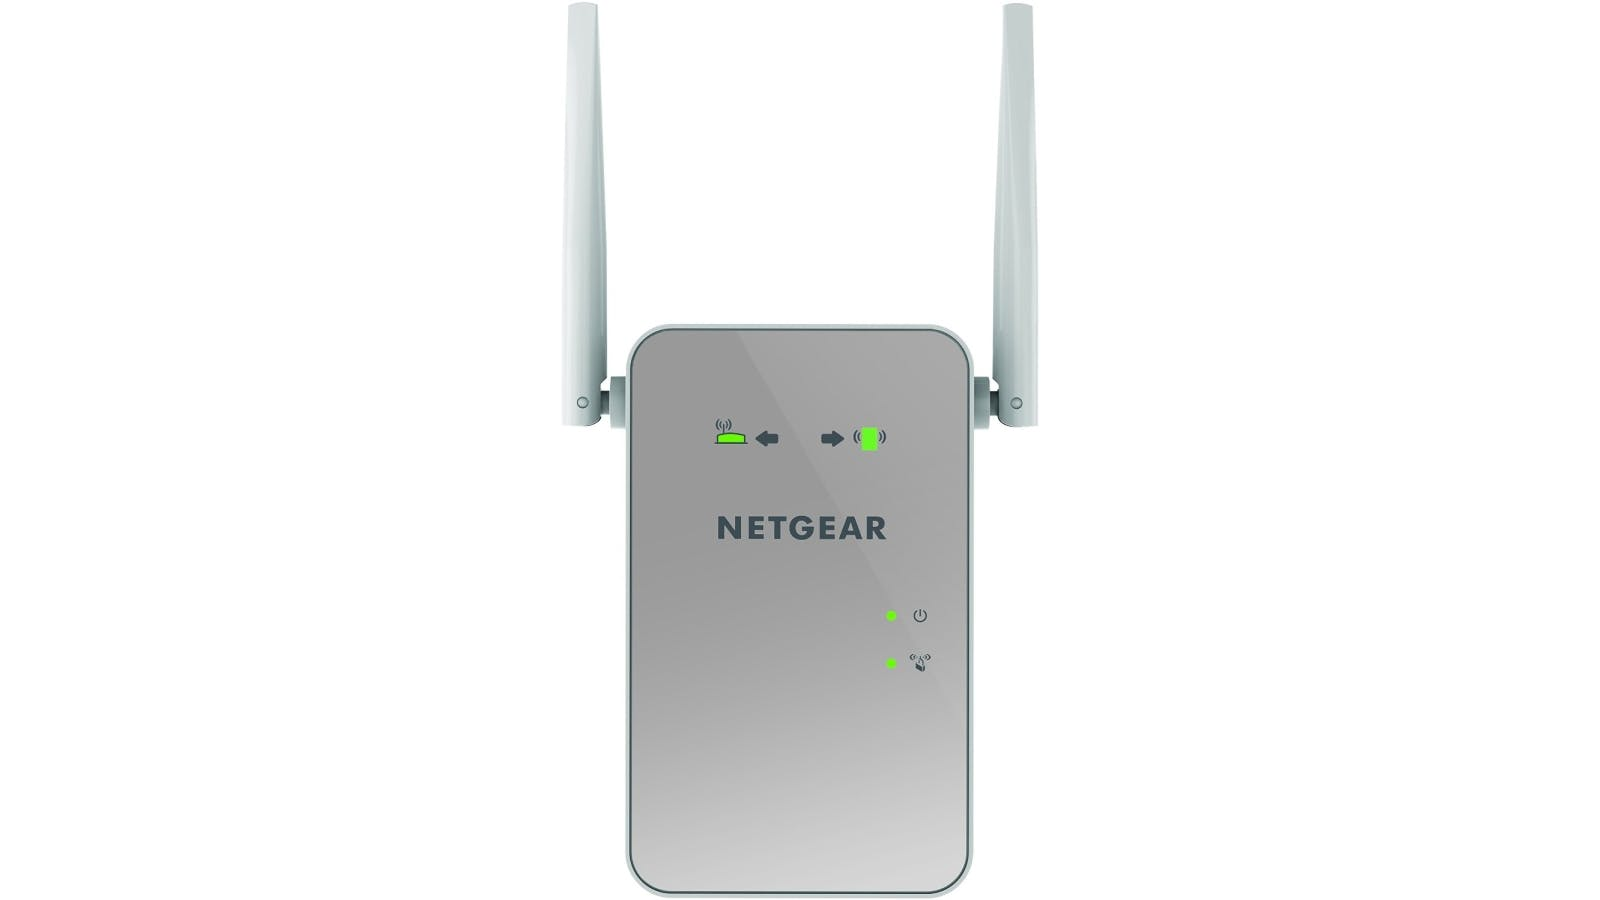 netgear ac1200 wifi range extender ex6150 manual